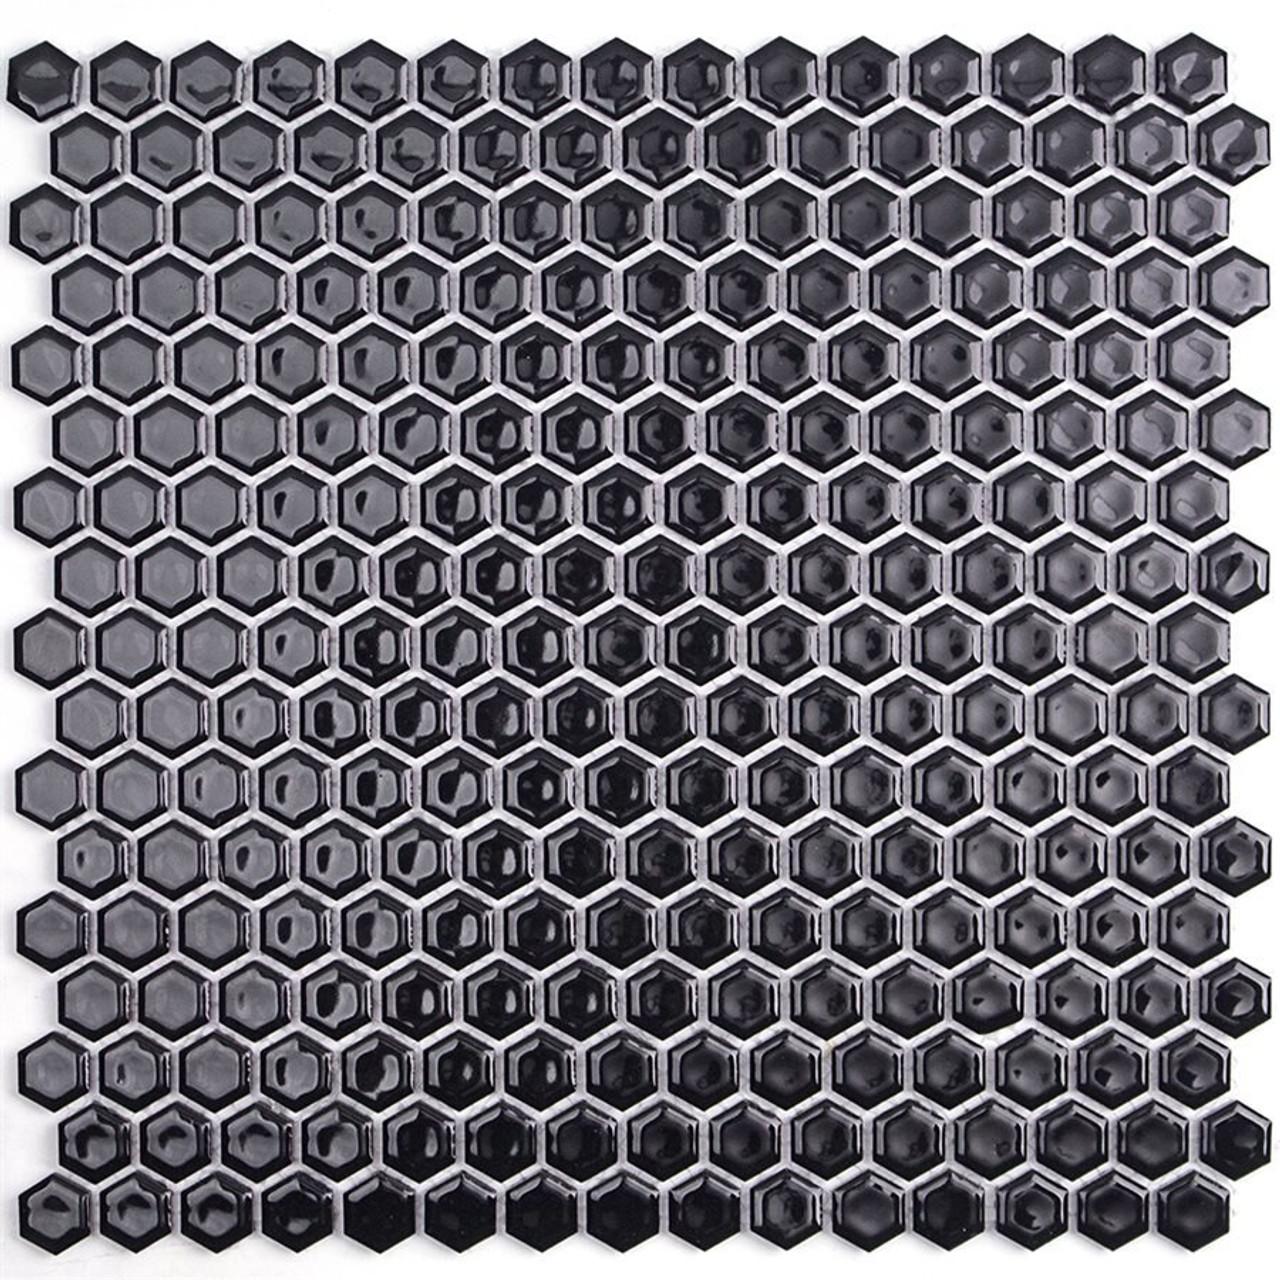 Soho Studio Simple Hexagon Solid Black Polished